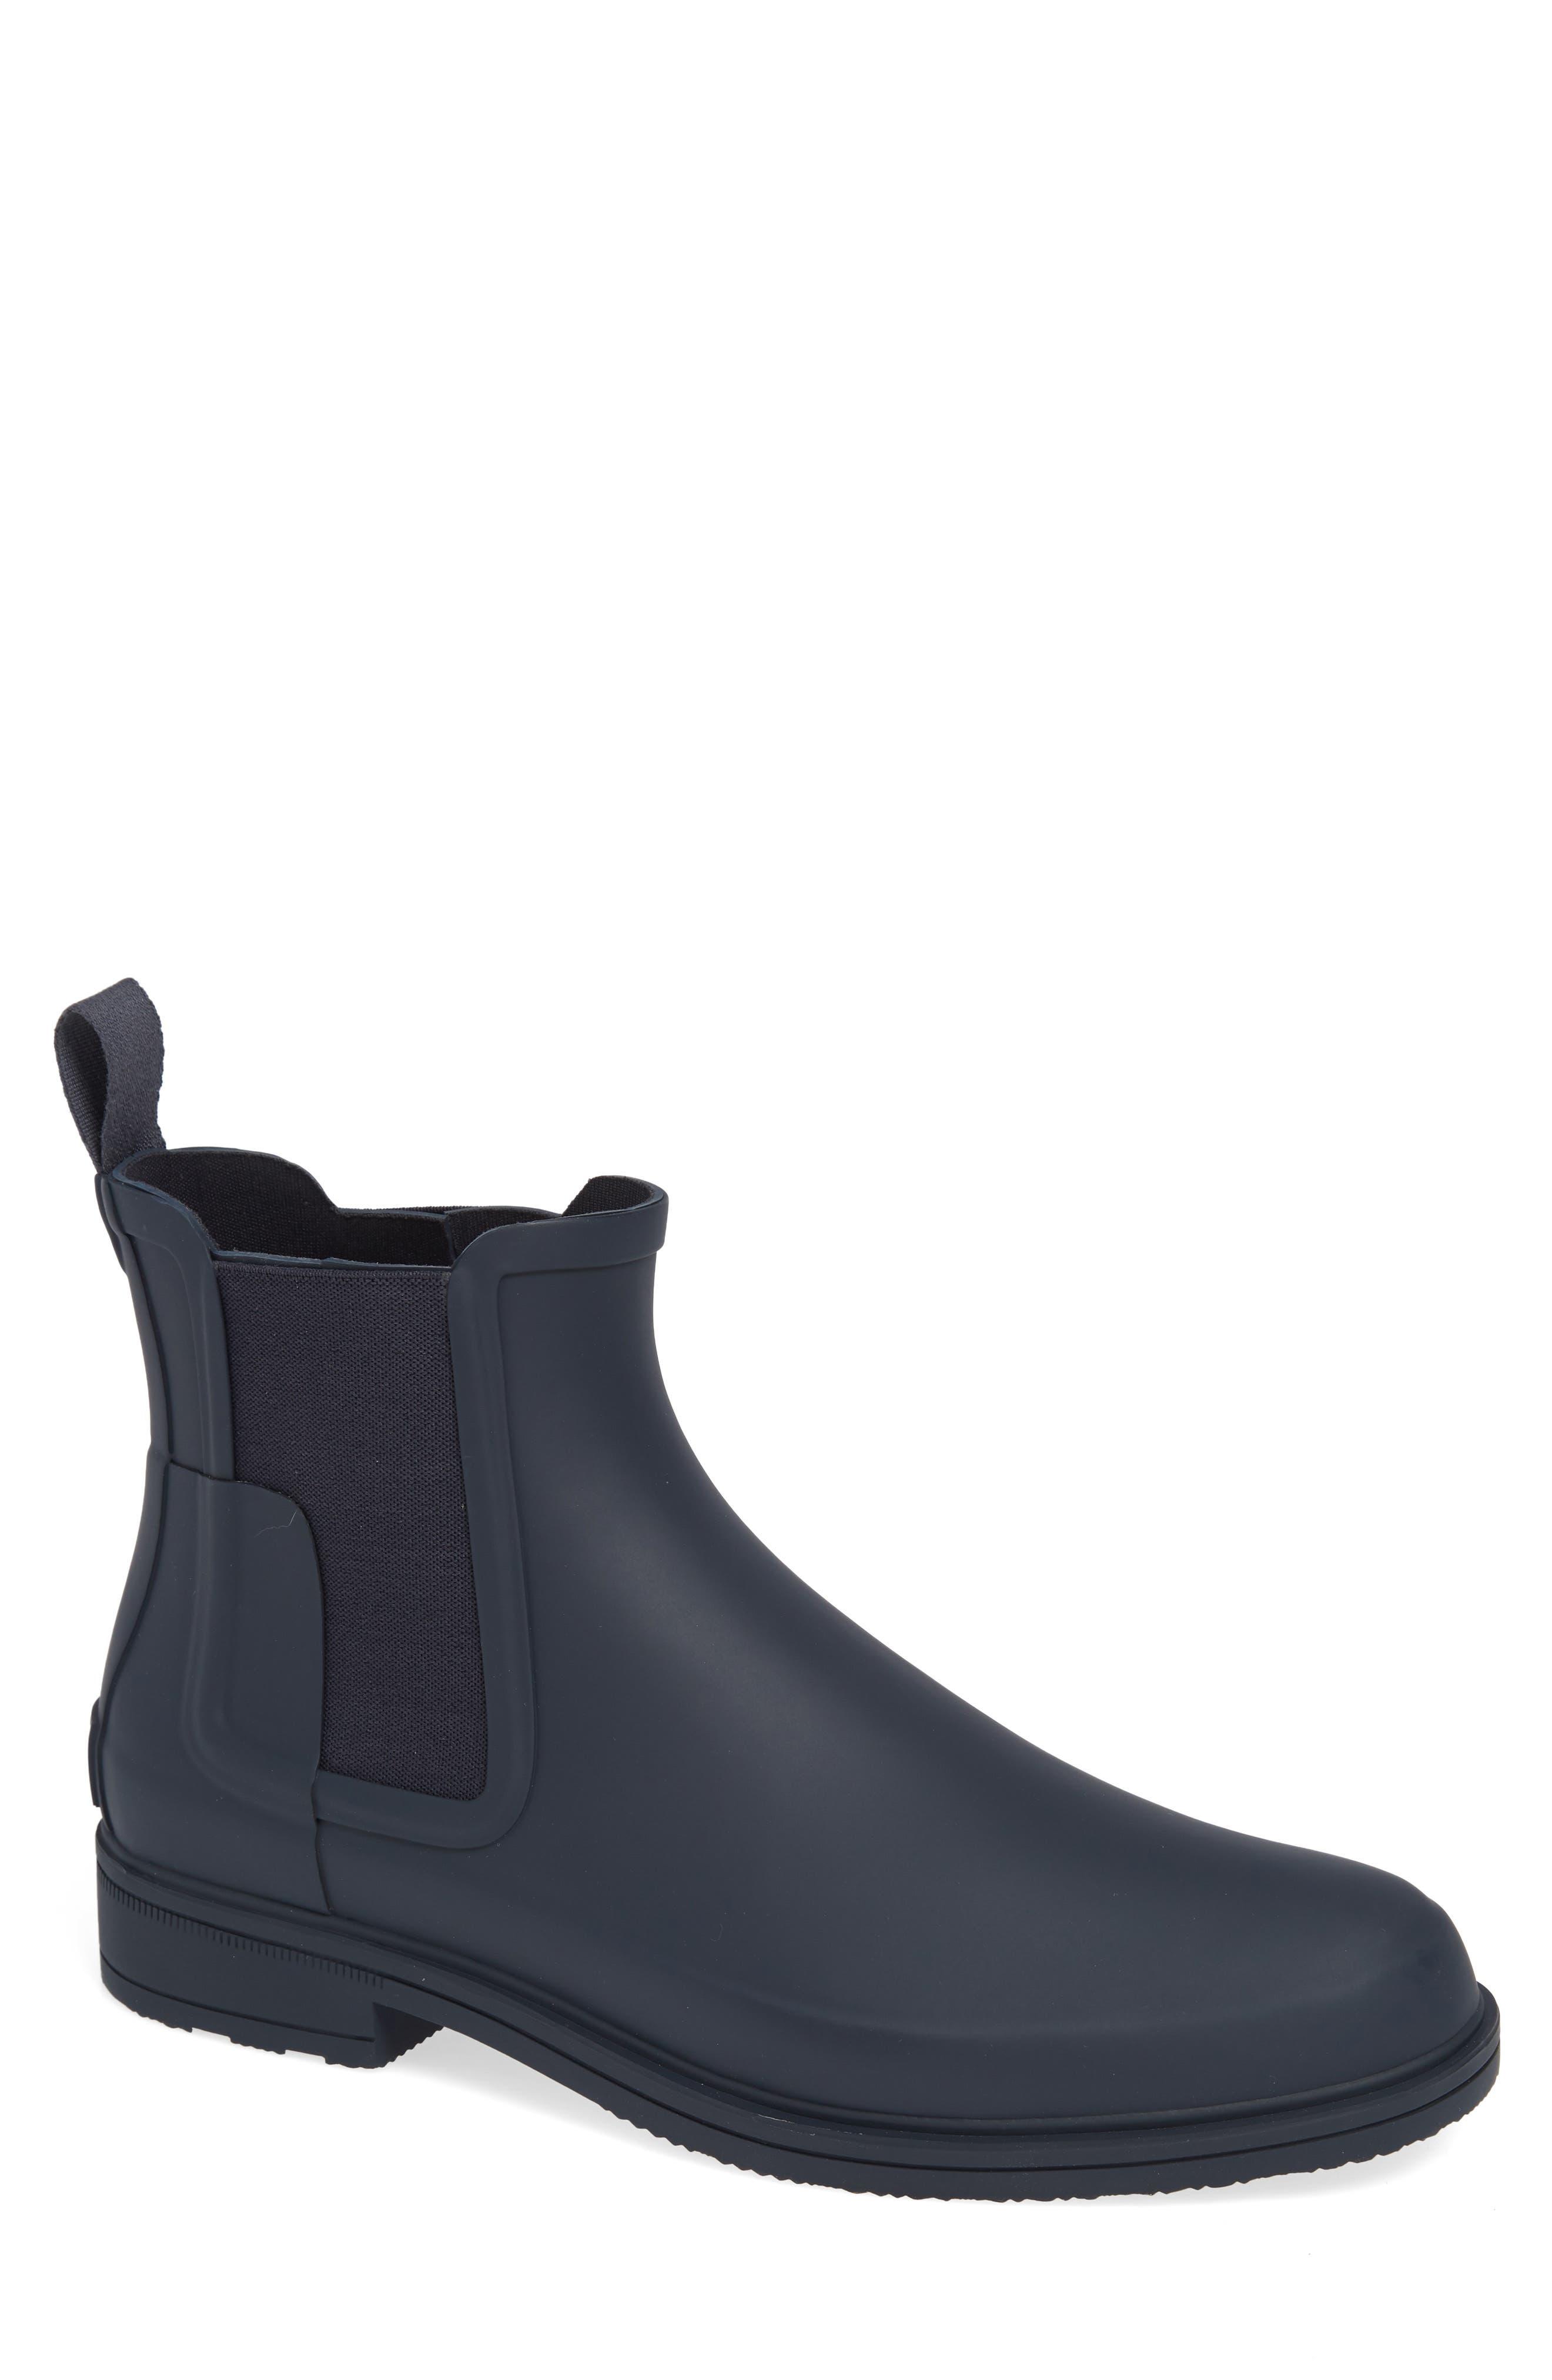 HUNTER,                             Original Refined Waterproof Chelsea Boot,                             Main thumbnail 1, color,                             NAVY RUBBER